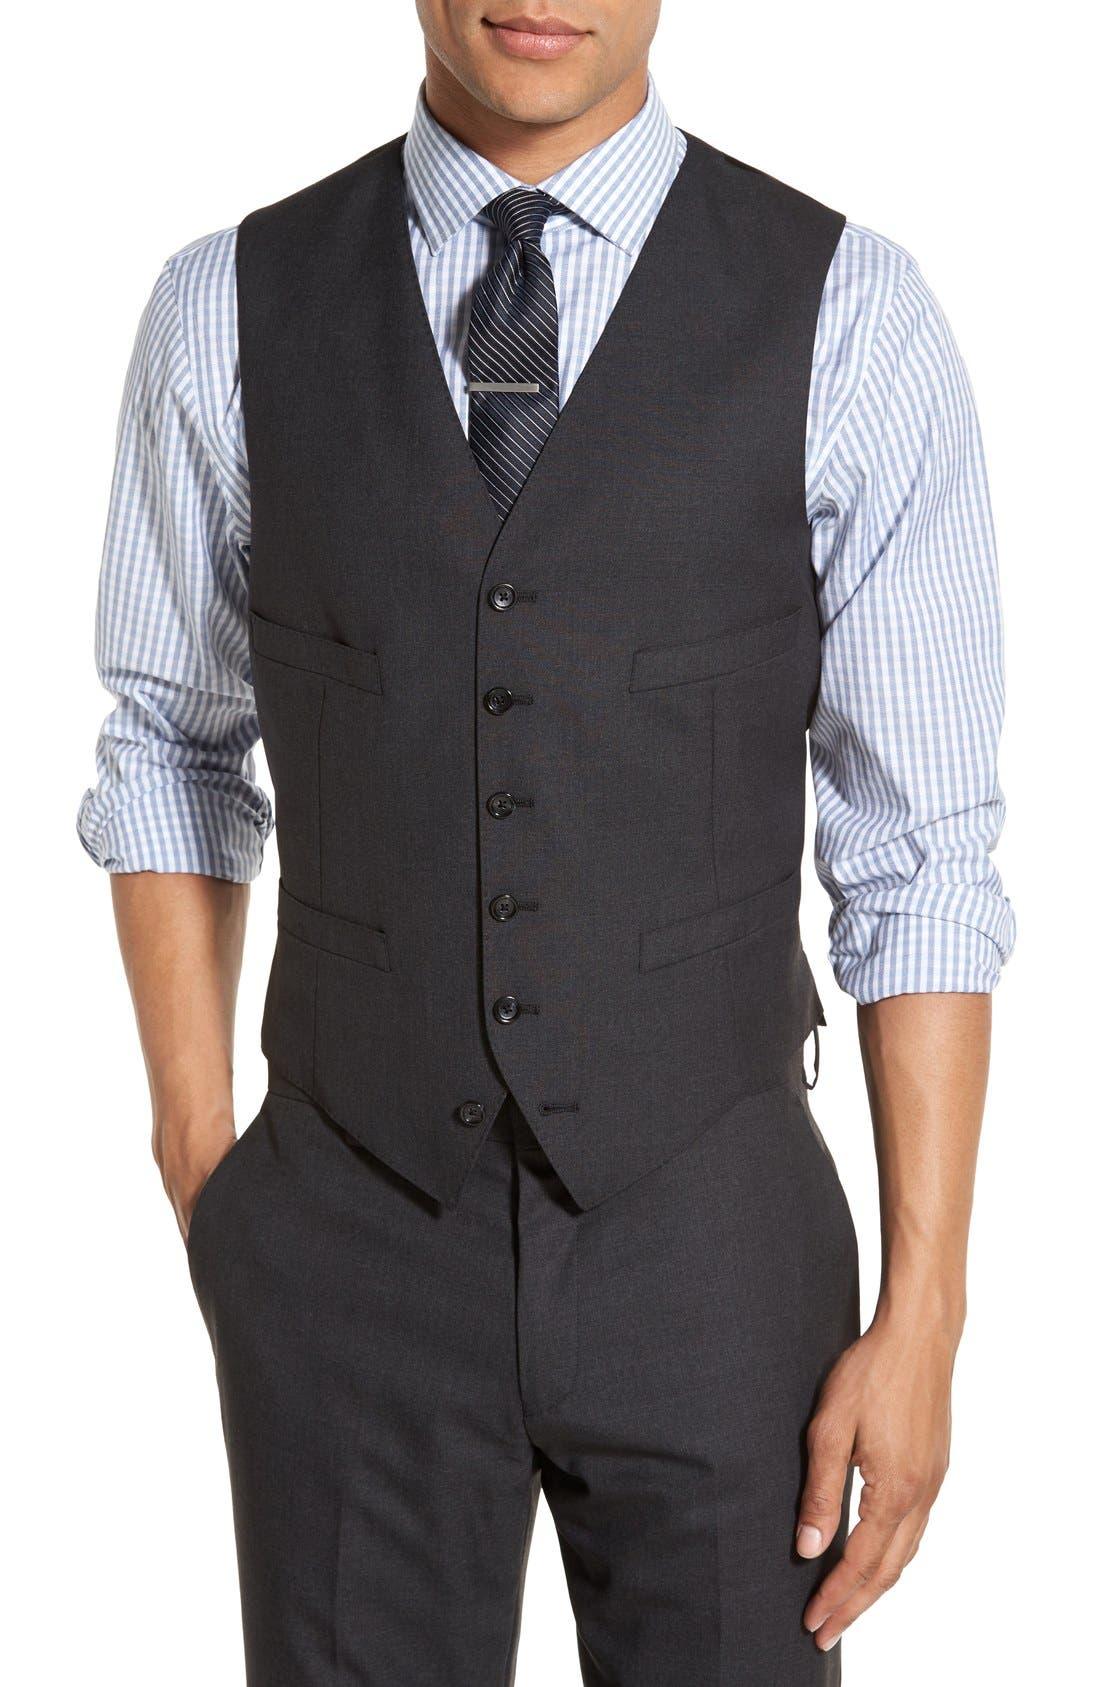 Ludlow Trim Fit Solid Wool Vest,                             Main thumbnail 1, color,                             Charcoal